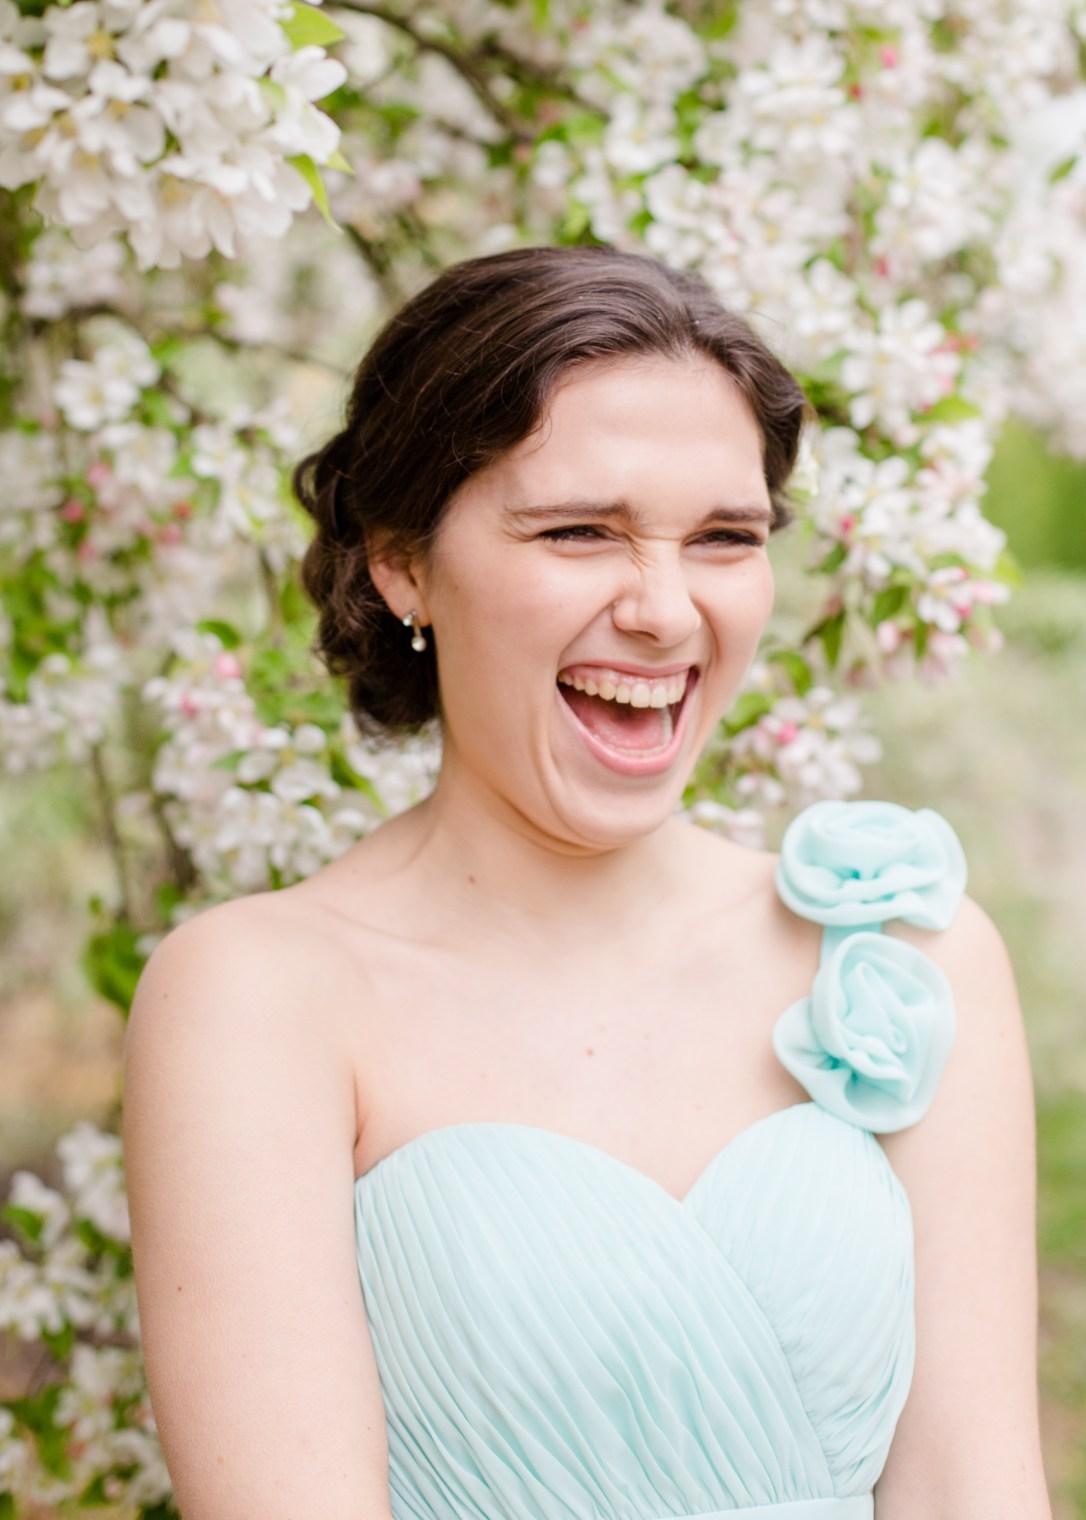 Adel laughing, pastel green bridesmaid dress